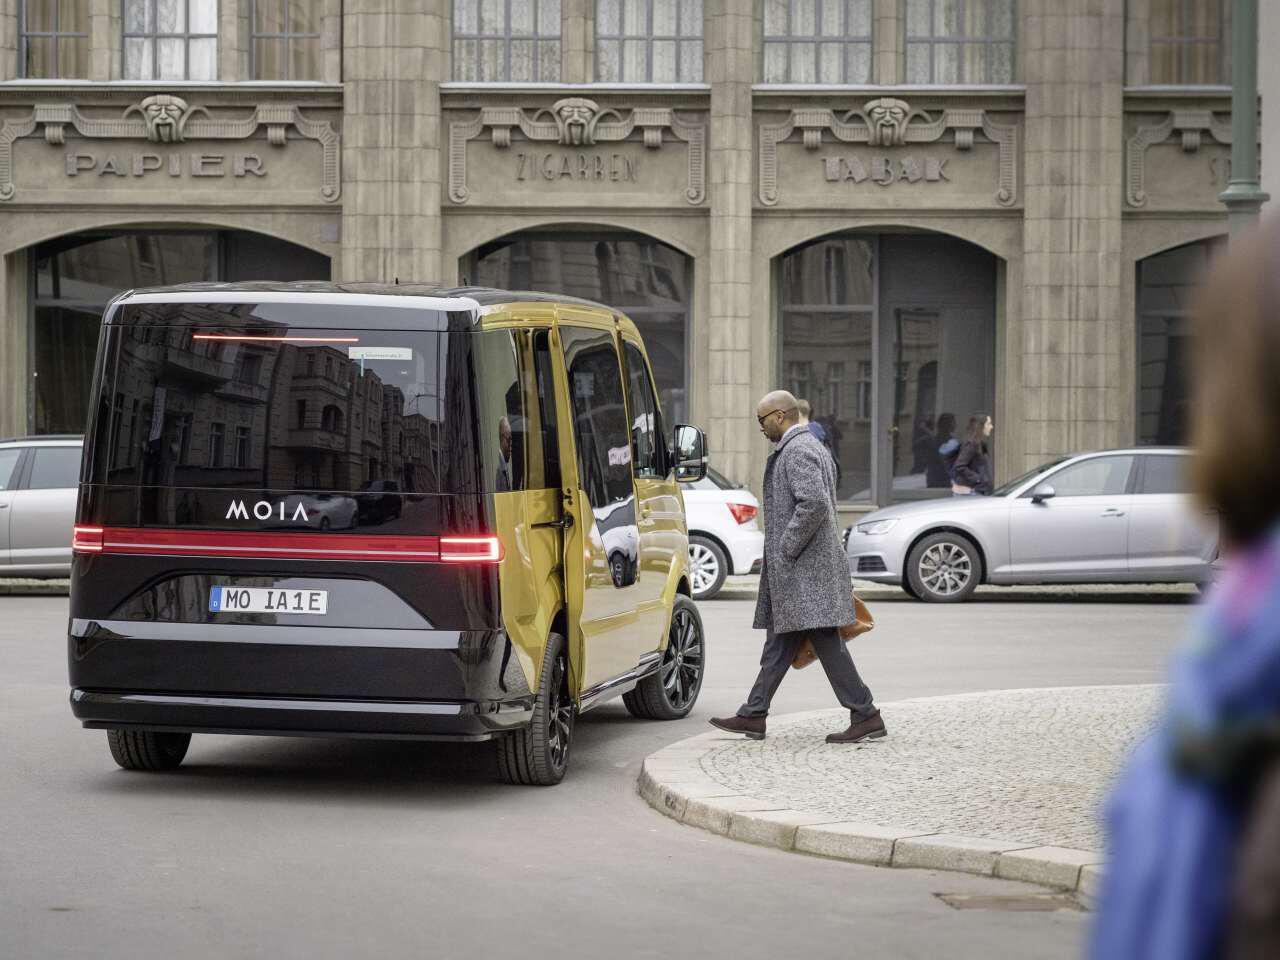 Bild zu MOIA Ridesharing-Fahrzeug